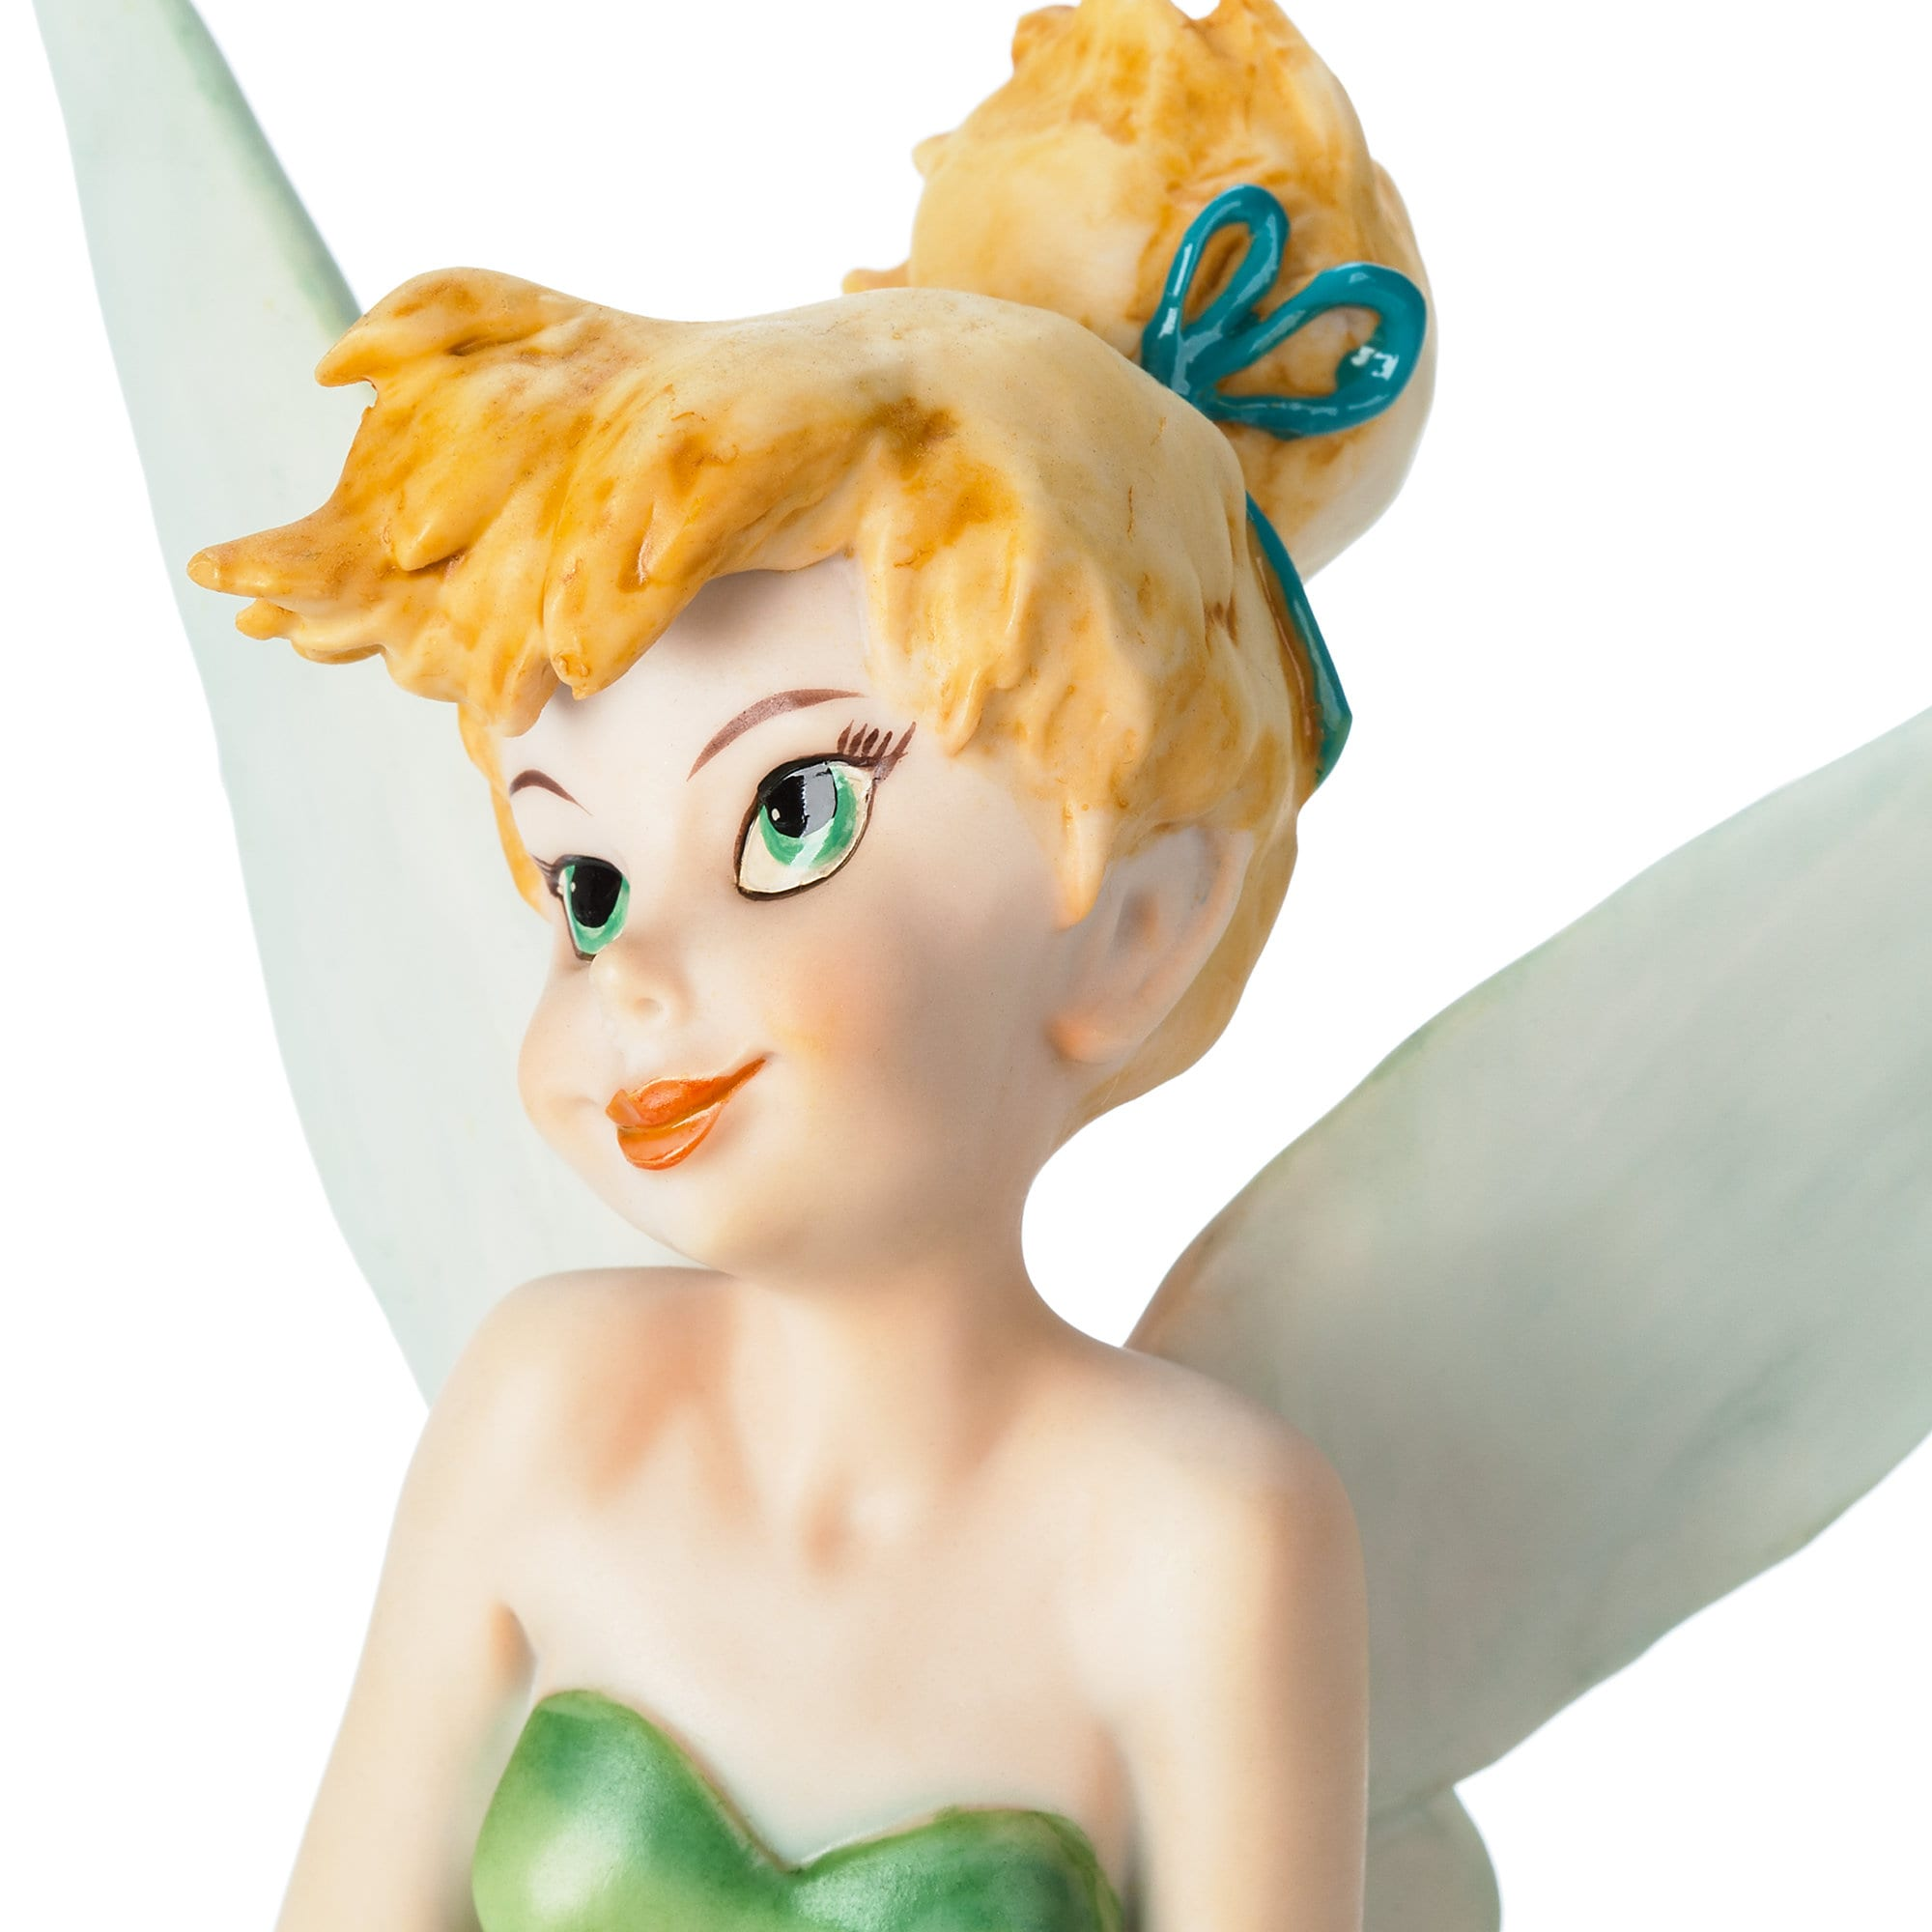 Tinker Bell Figure by Giuseppe Armani